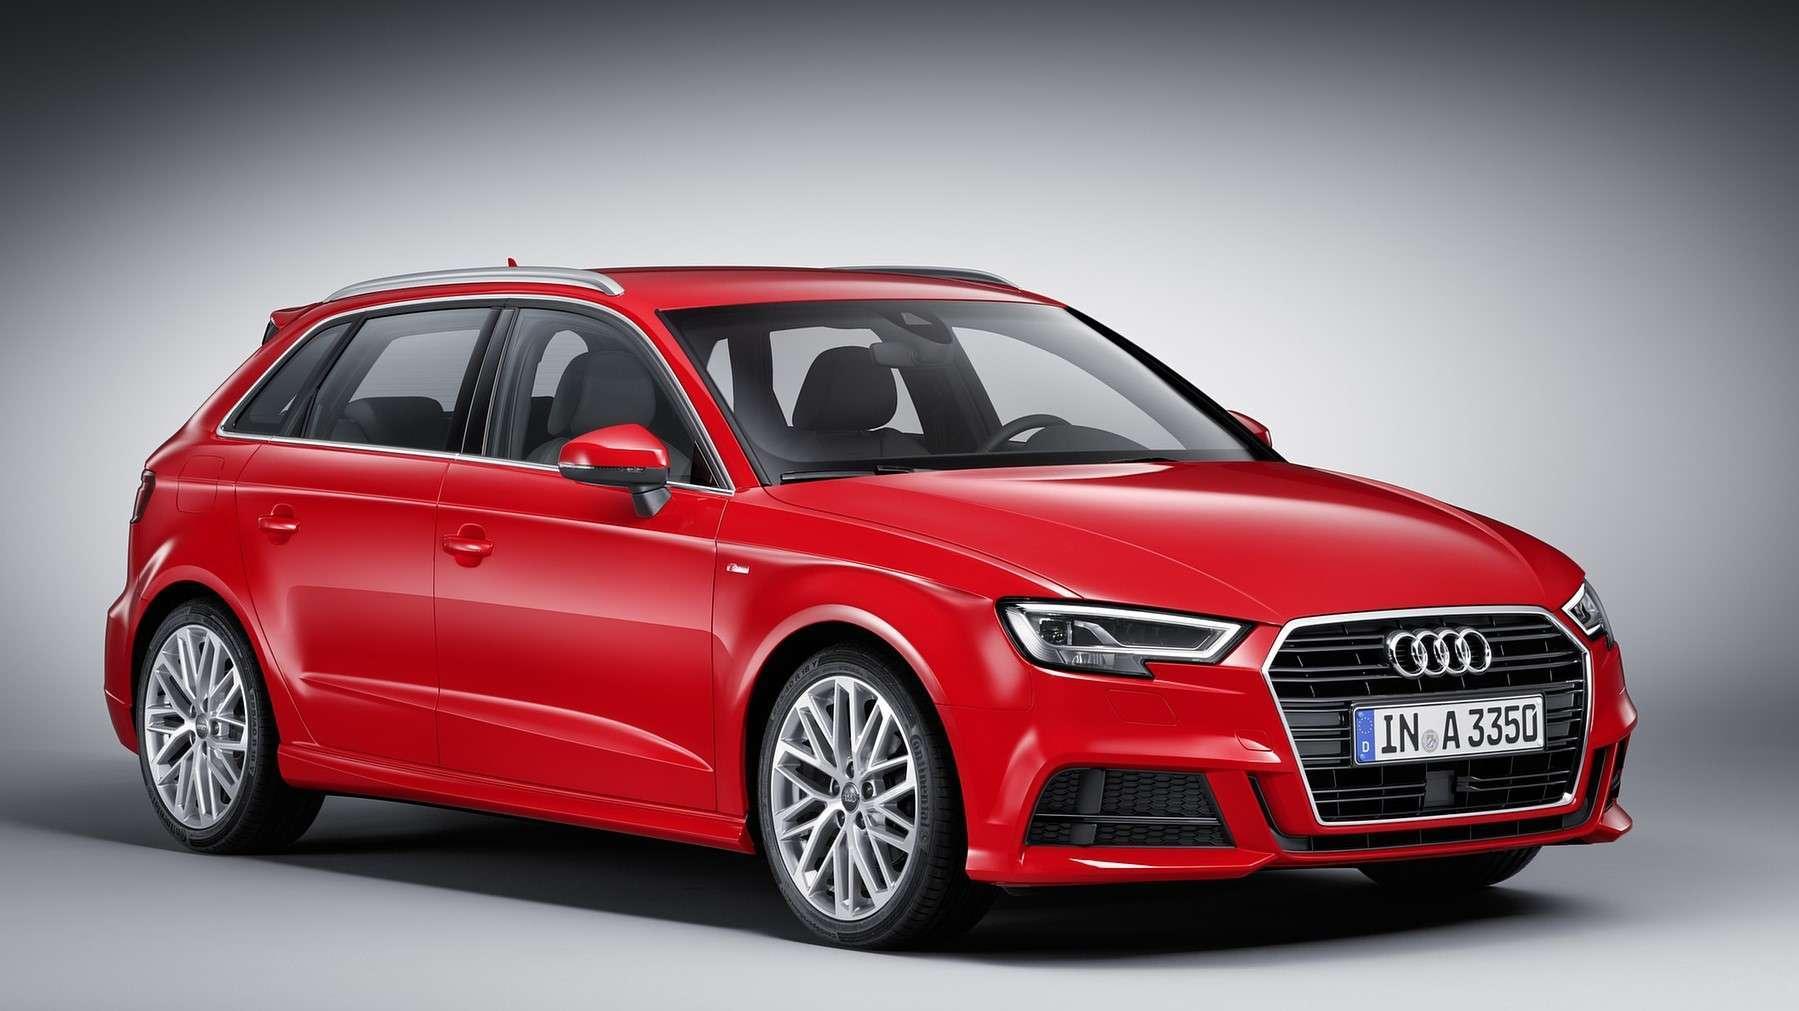 a3 spb - Audi A3 SPB 1.6 TDI S TRONIC BUSINESS